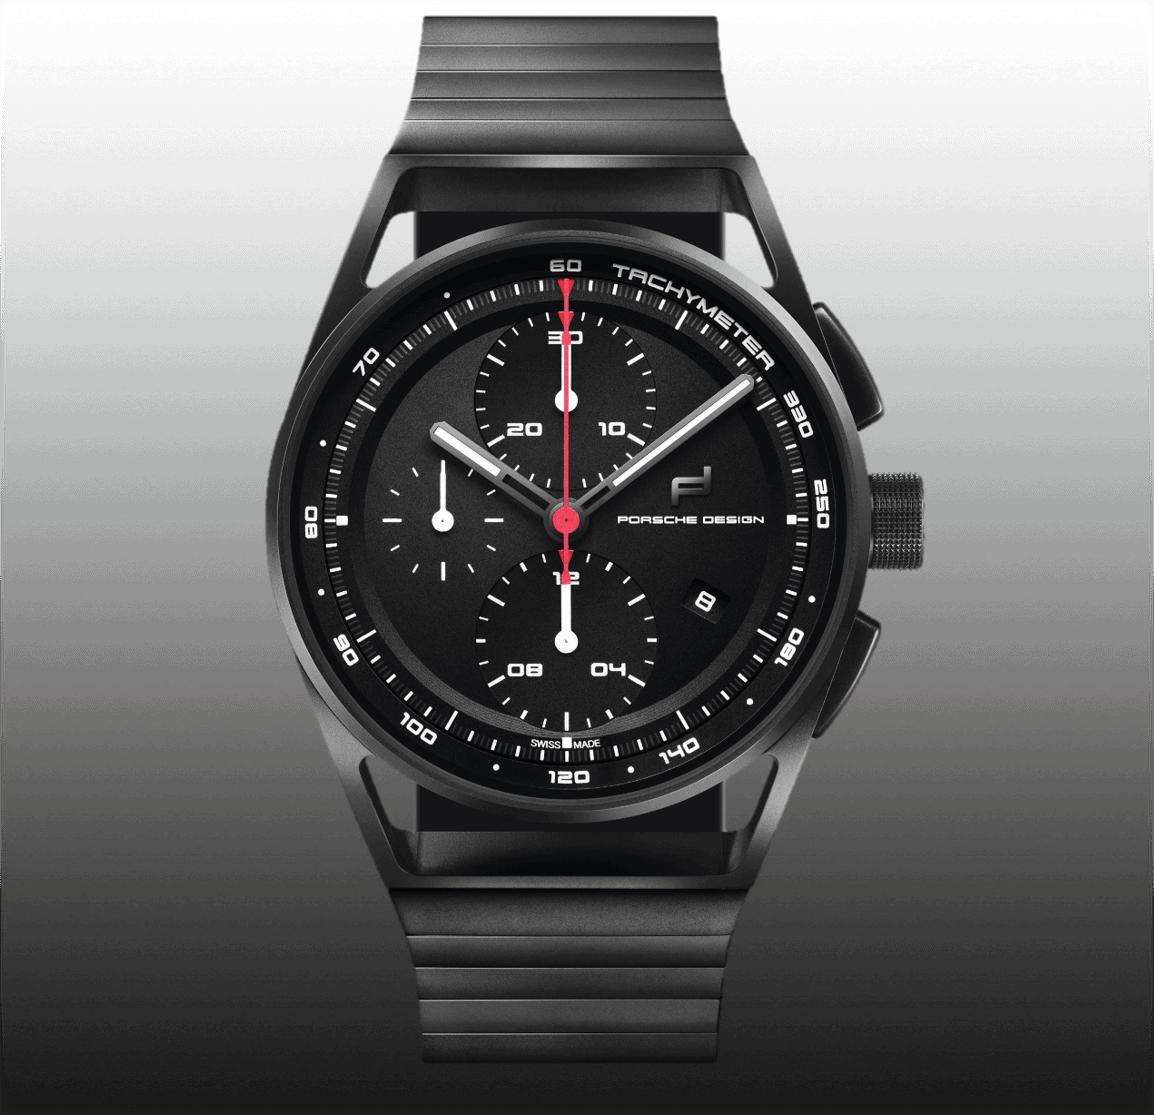 Porsche-Design 1919 Chronotimer All Black 2016